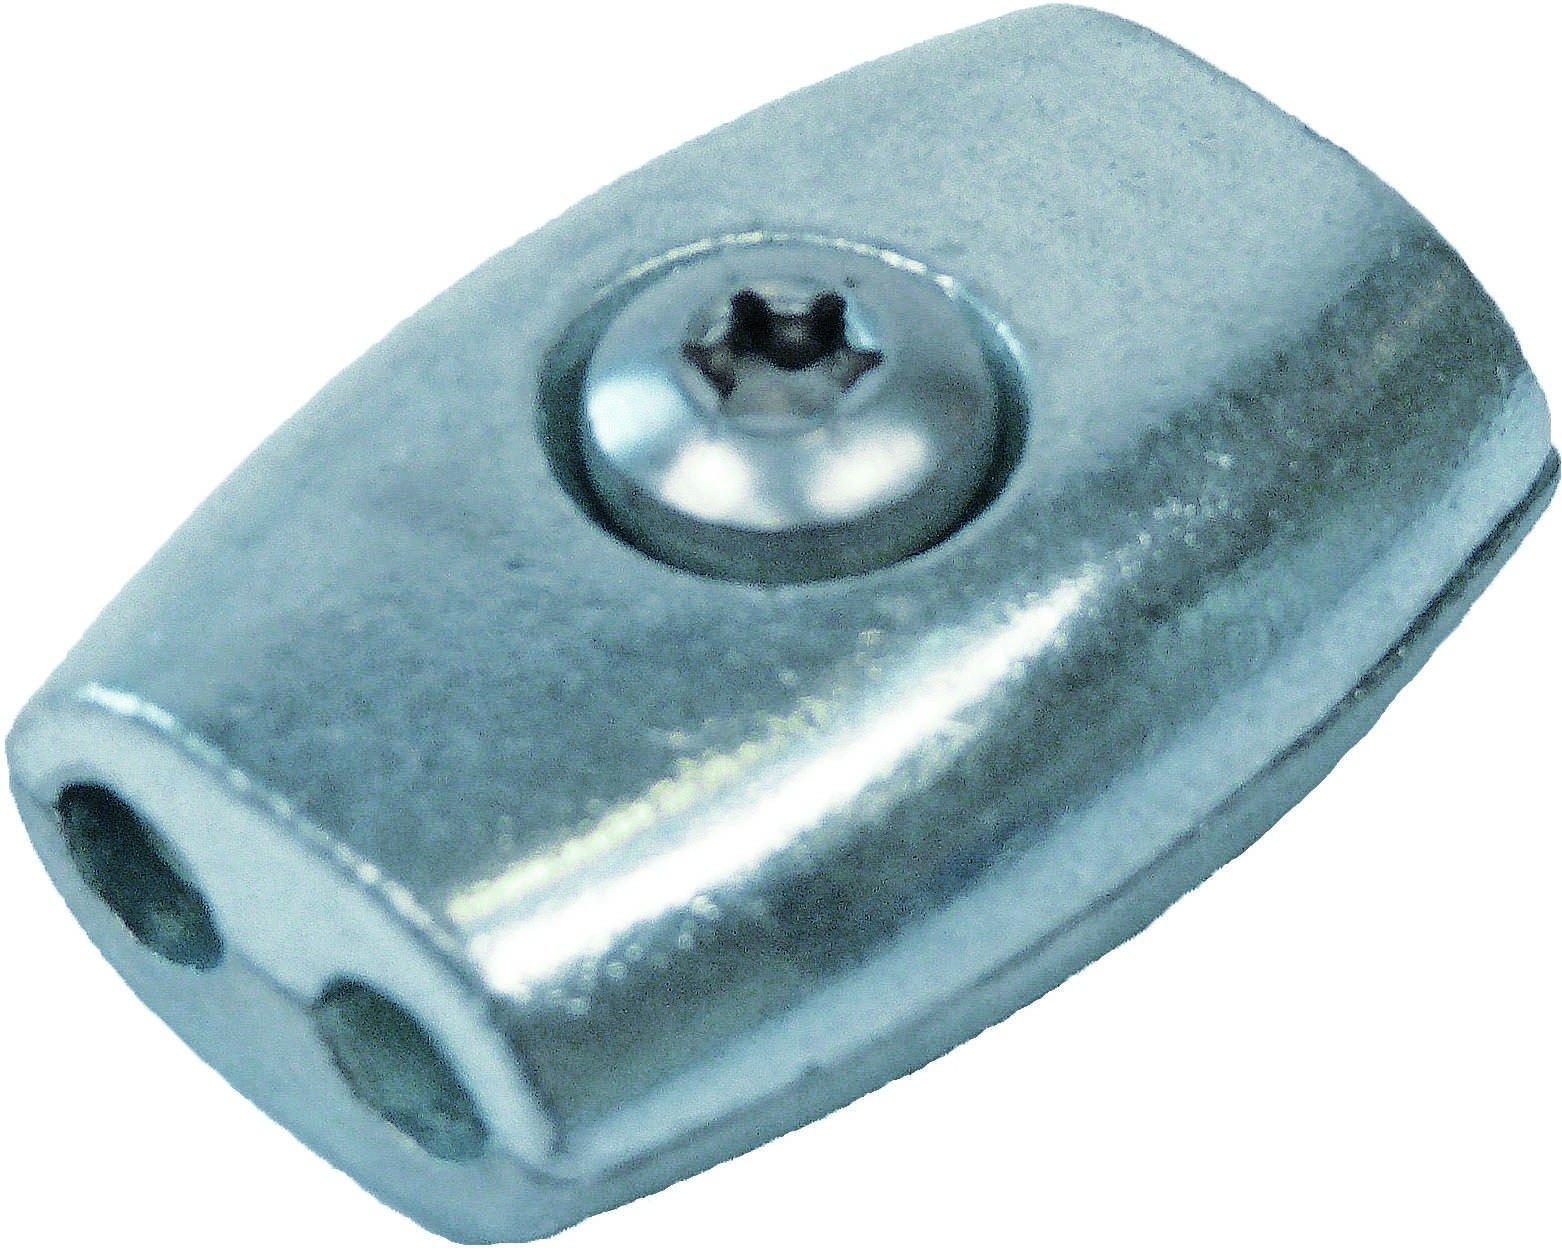 Staaldraadklem eivormig 3mm RVS A4 1 stuks